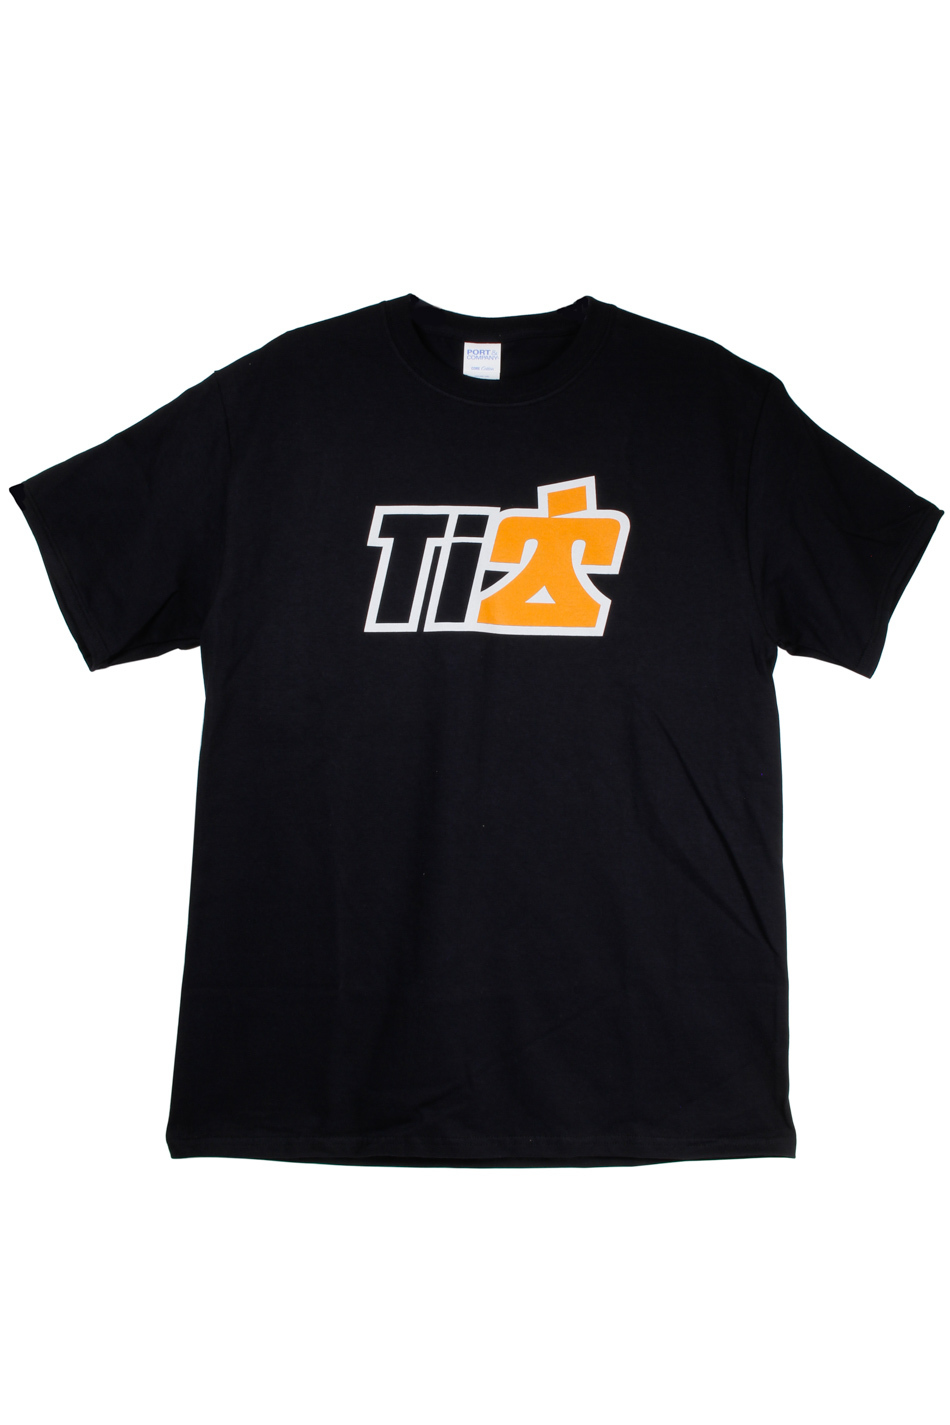 Ti22 Performance Ti22 Logo T-Shirt Black XXX-Large